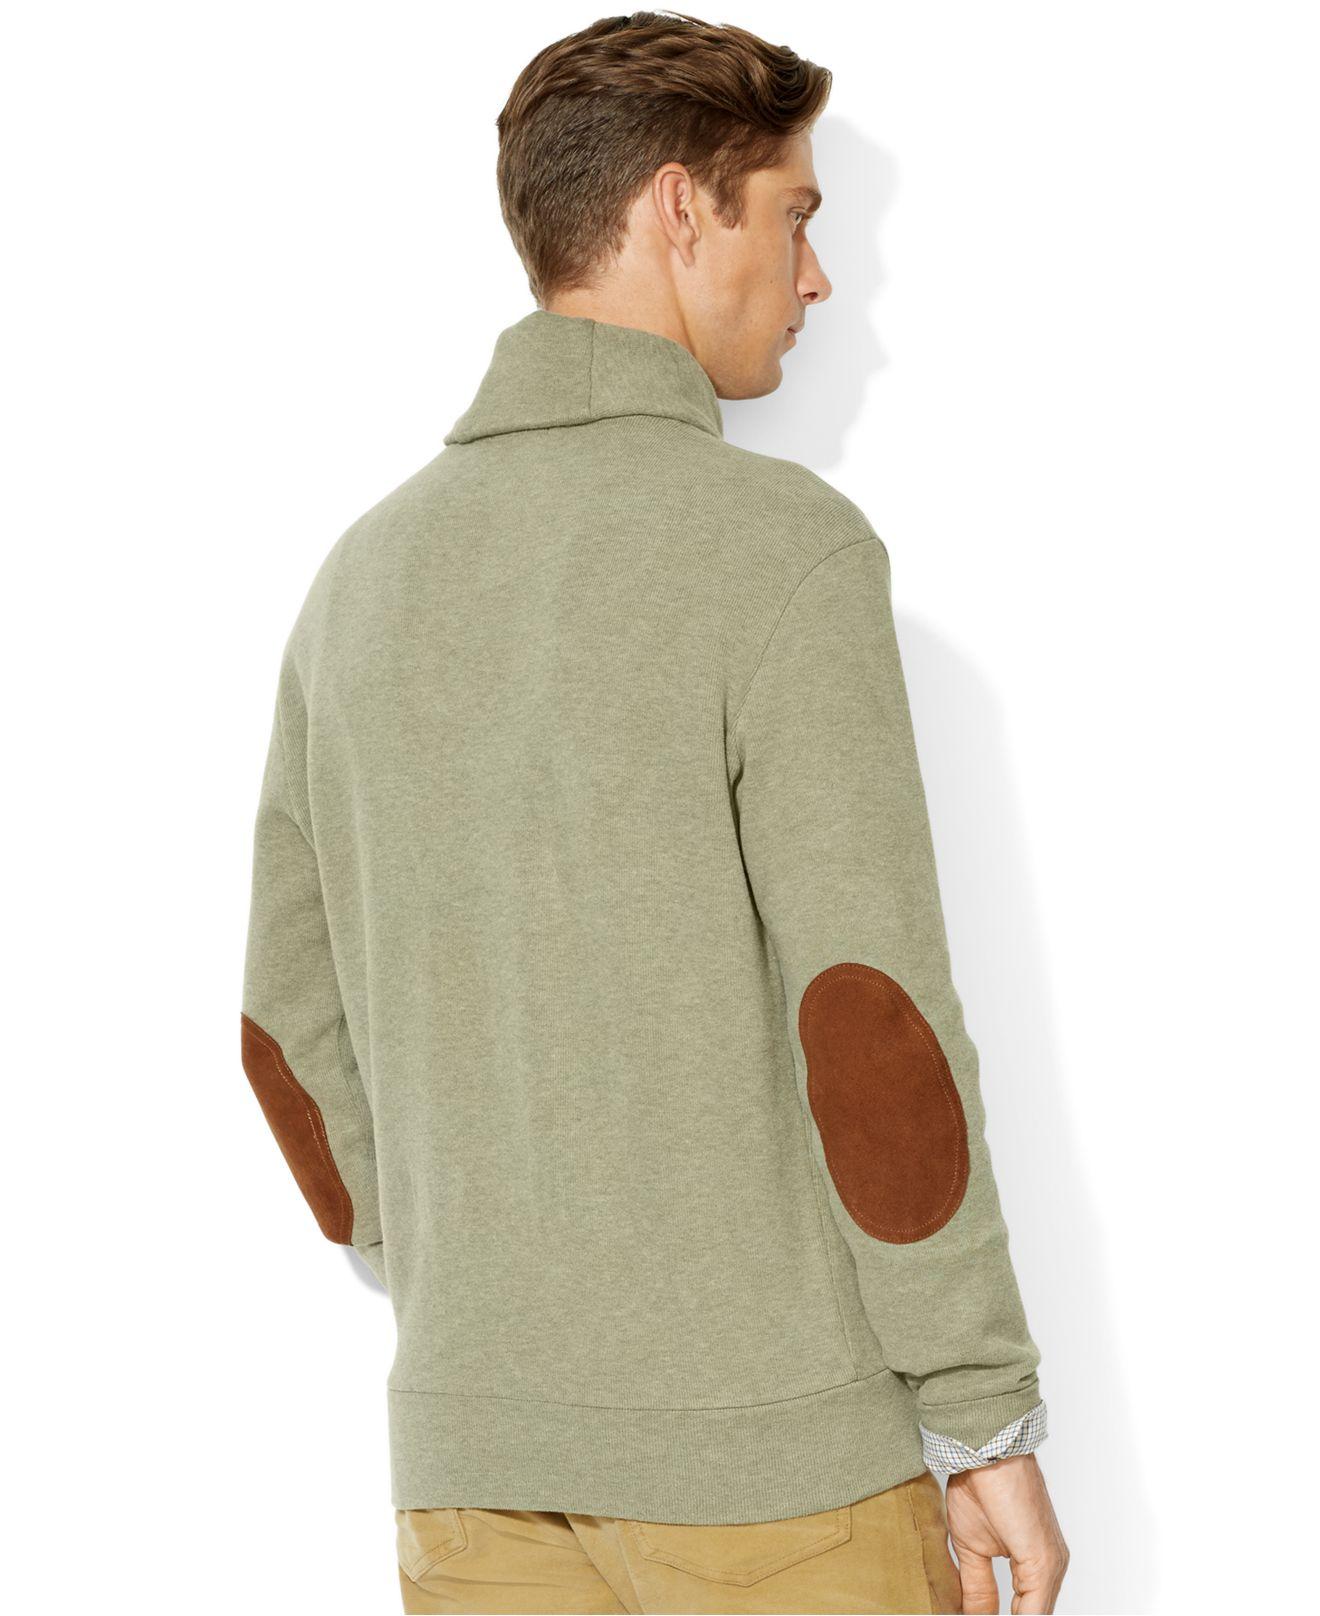 New Polo Ralph Lauren Men/'s French Rib Shawl Neck Pullover Sweatshirt Sweater